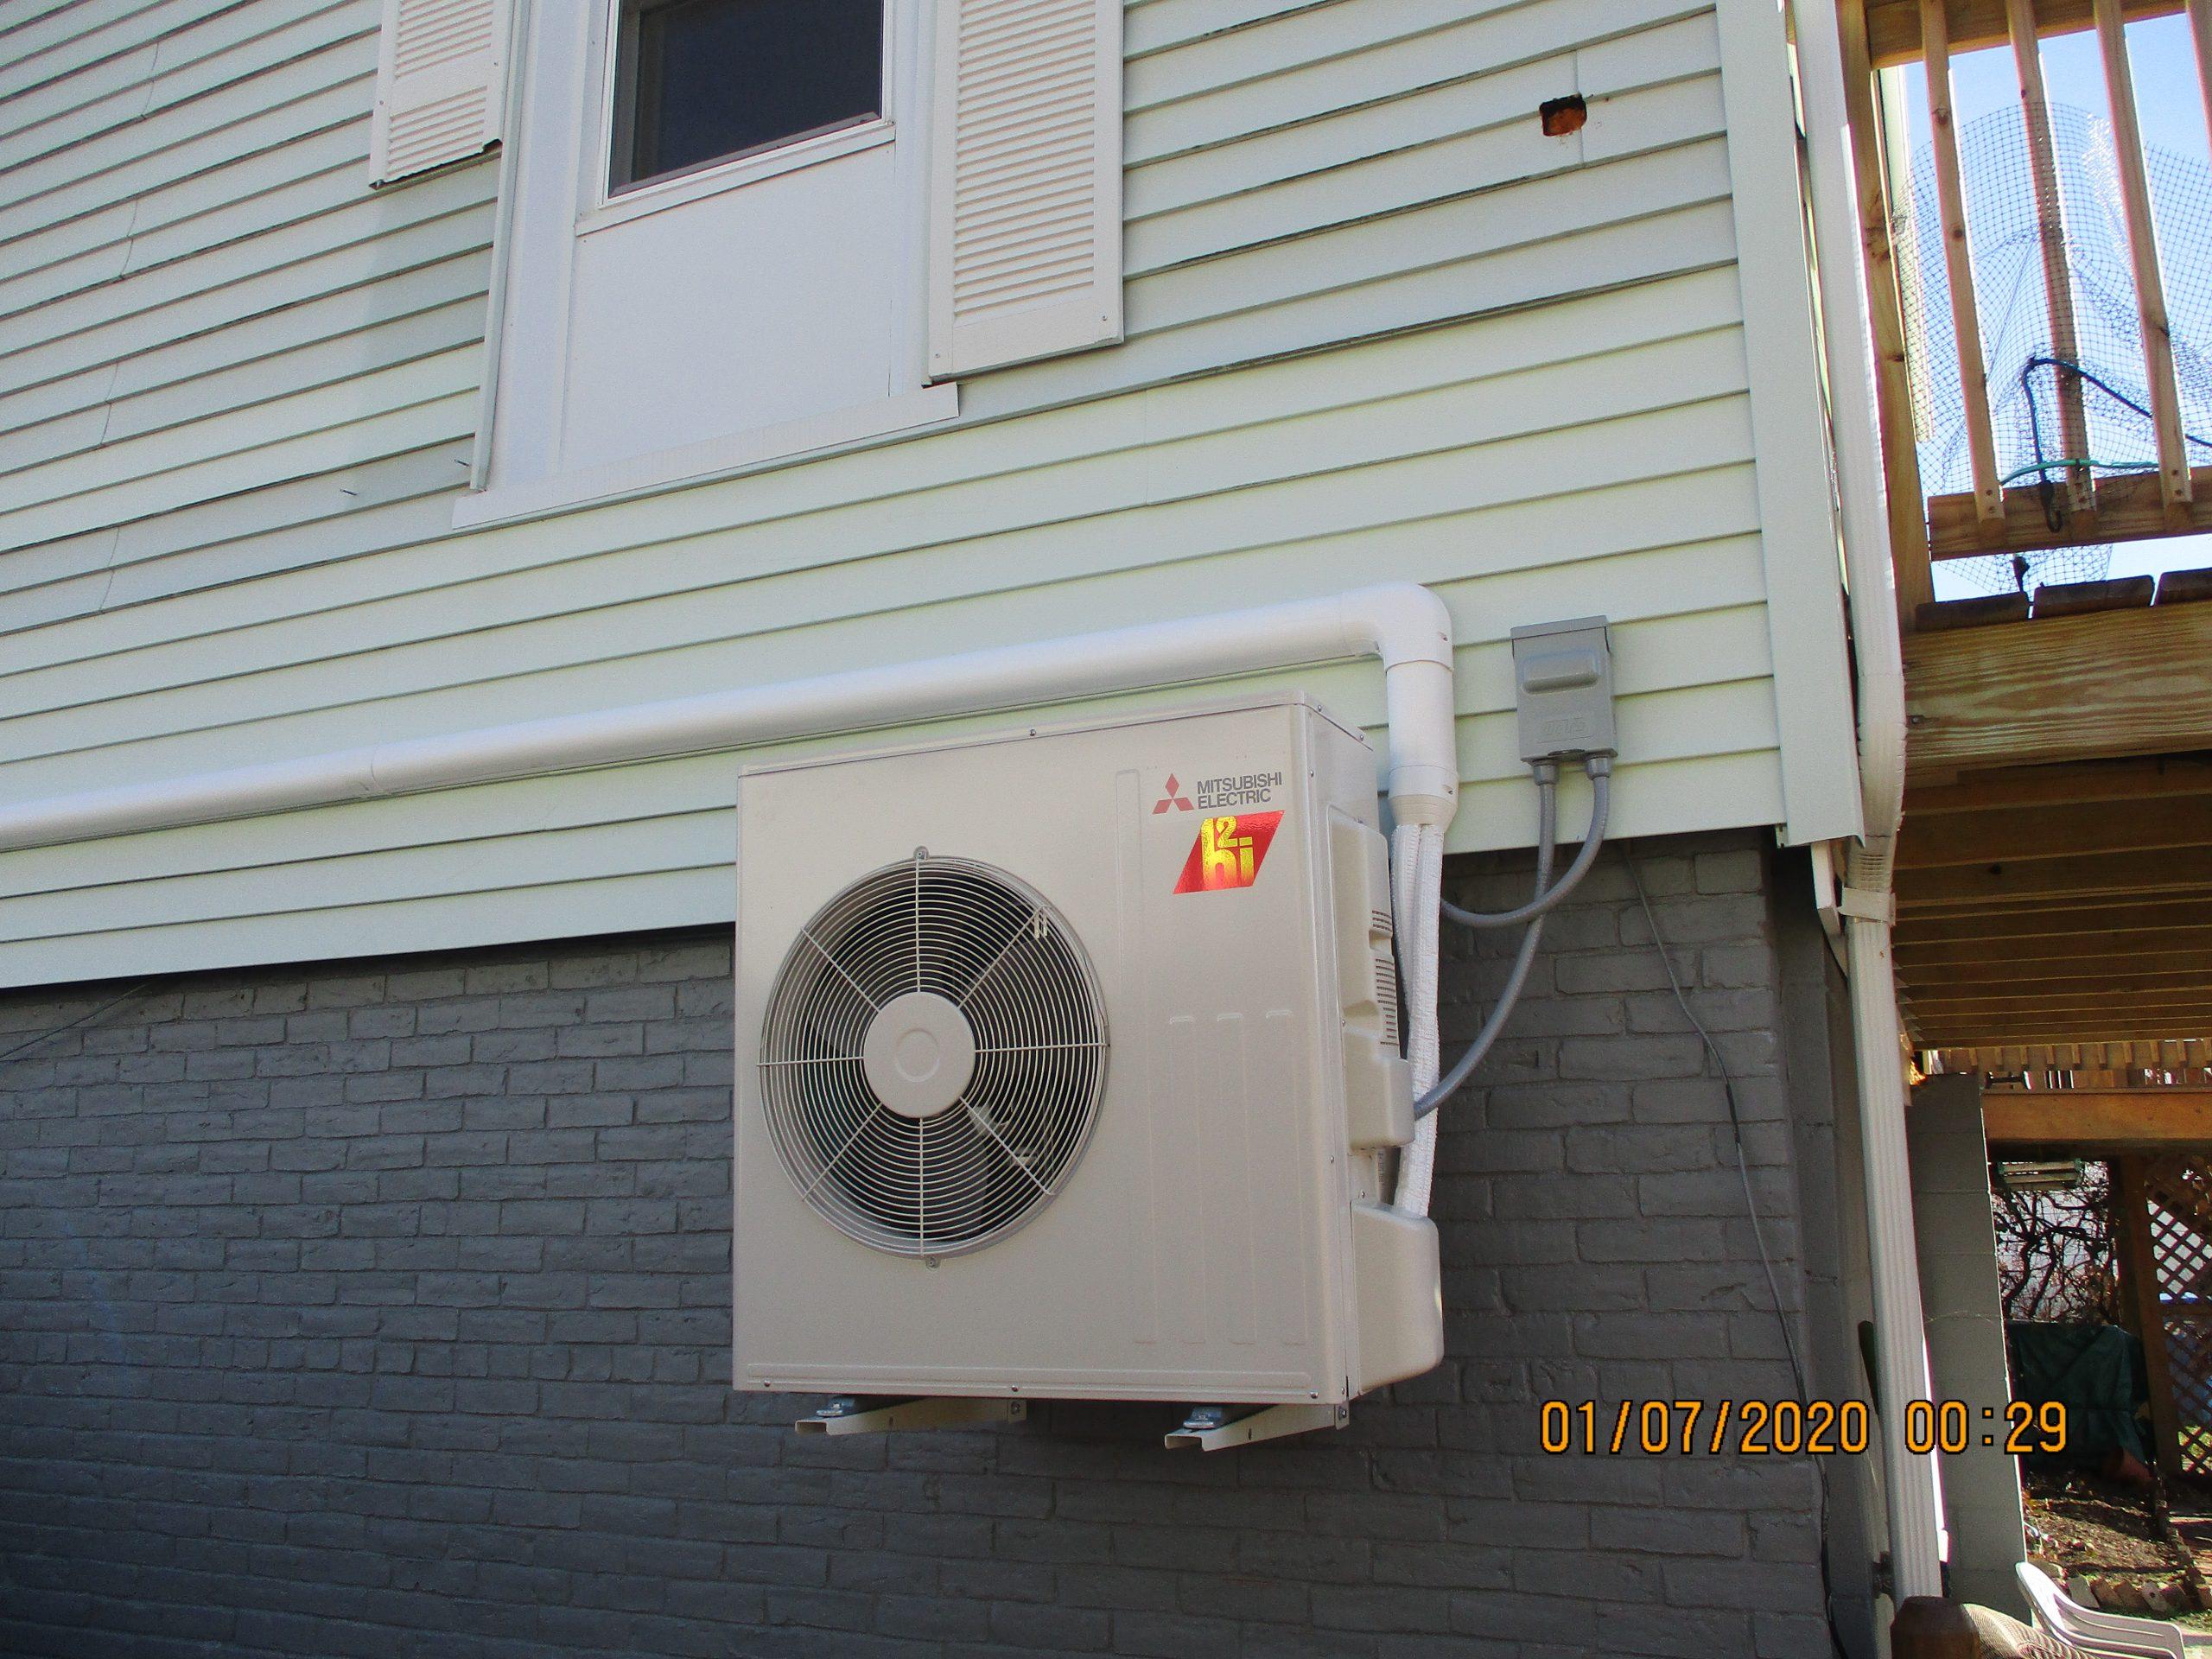 Outdoor condenser unit installed in Somerville, MA.